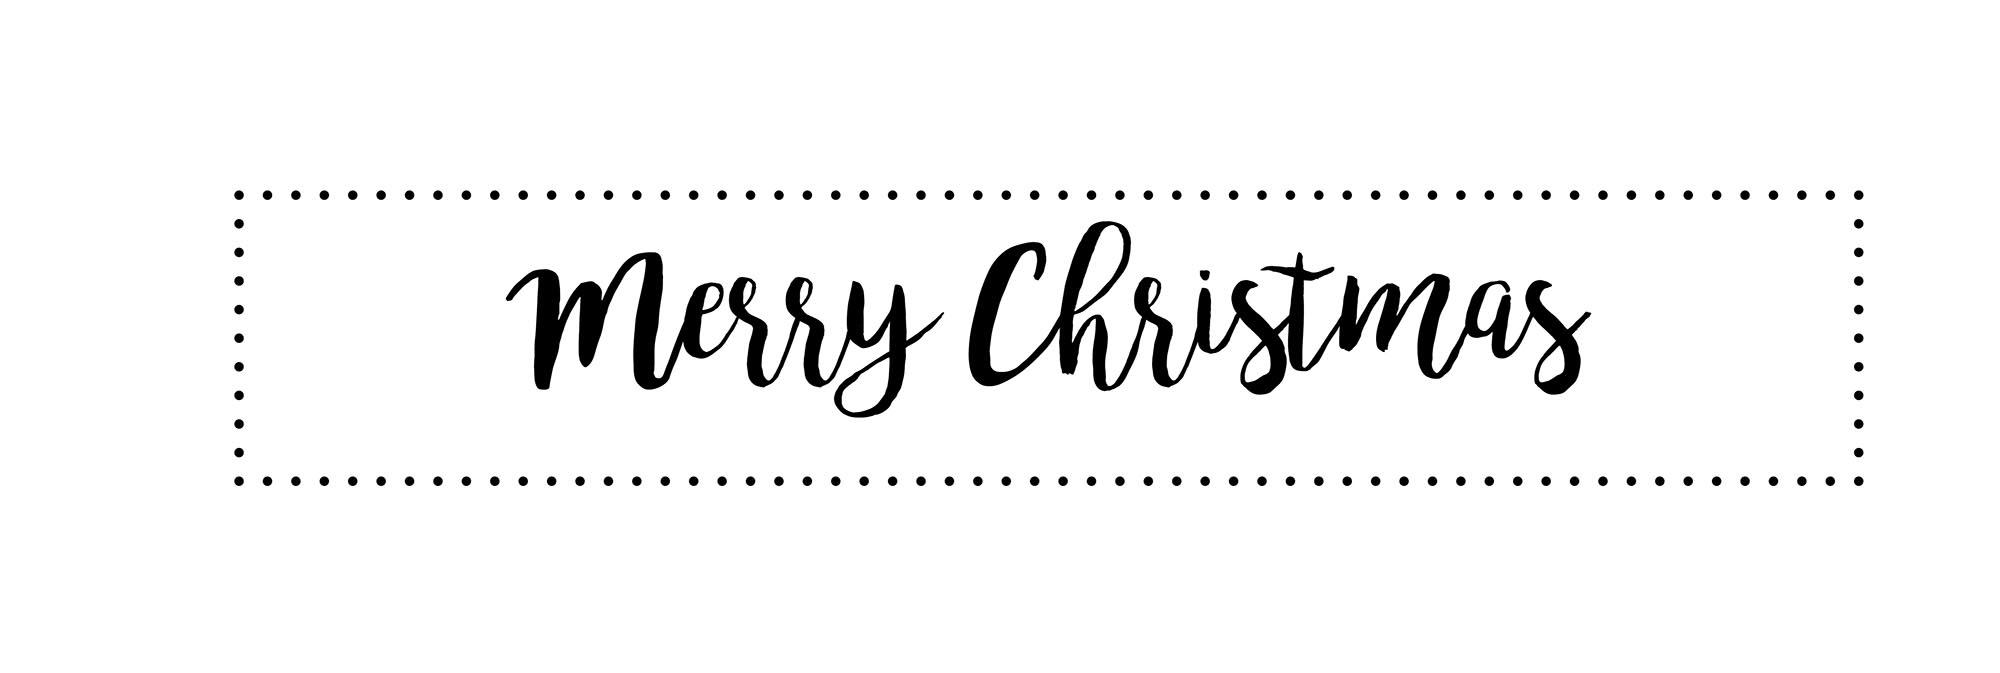 tekst-merry-christmas